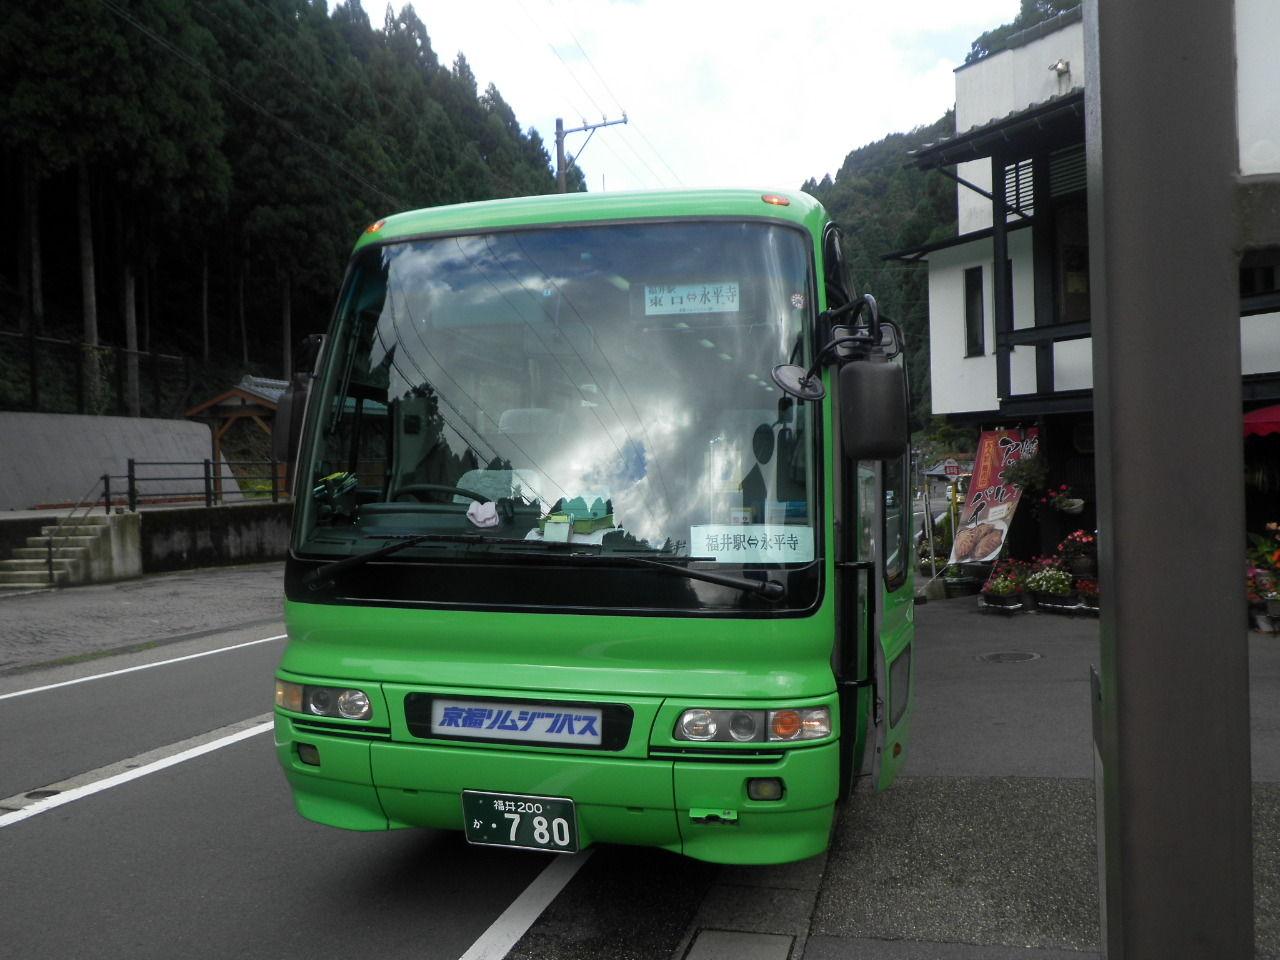 RIMG32677